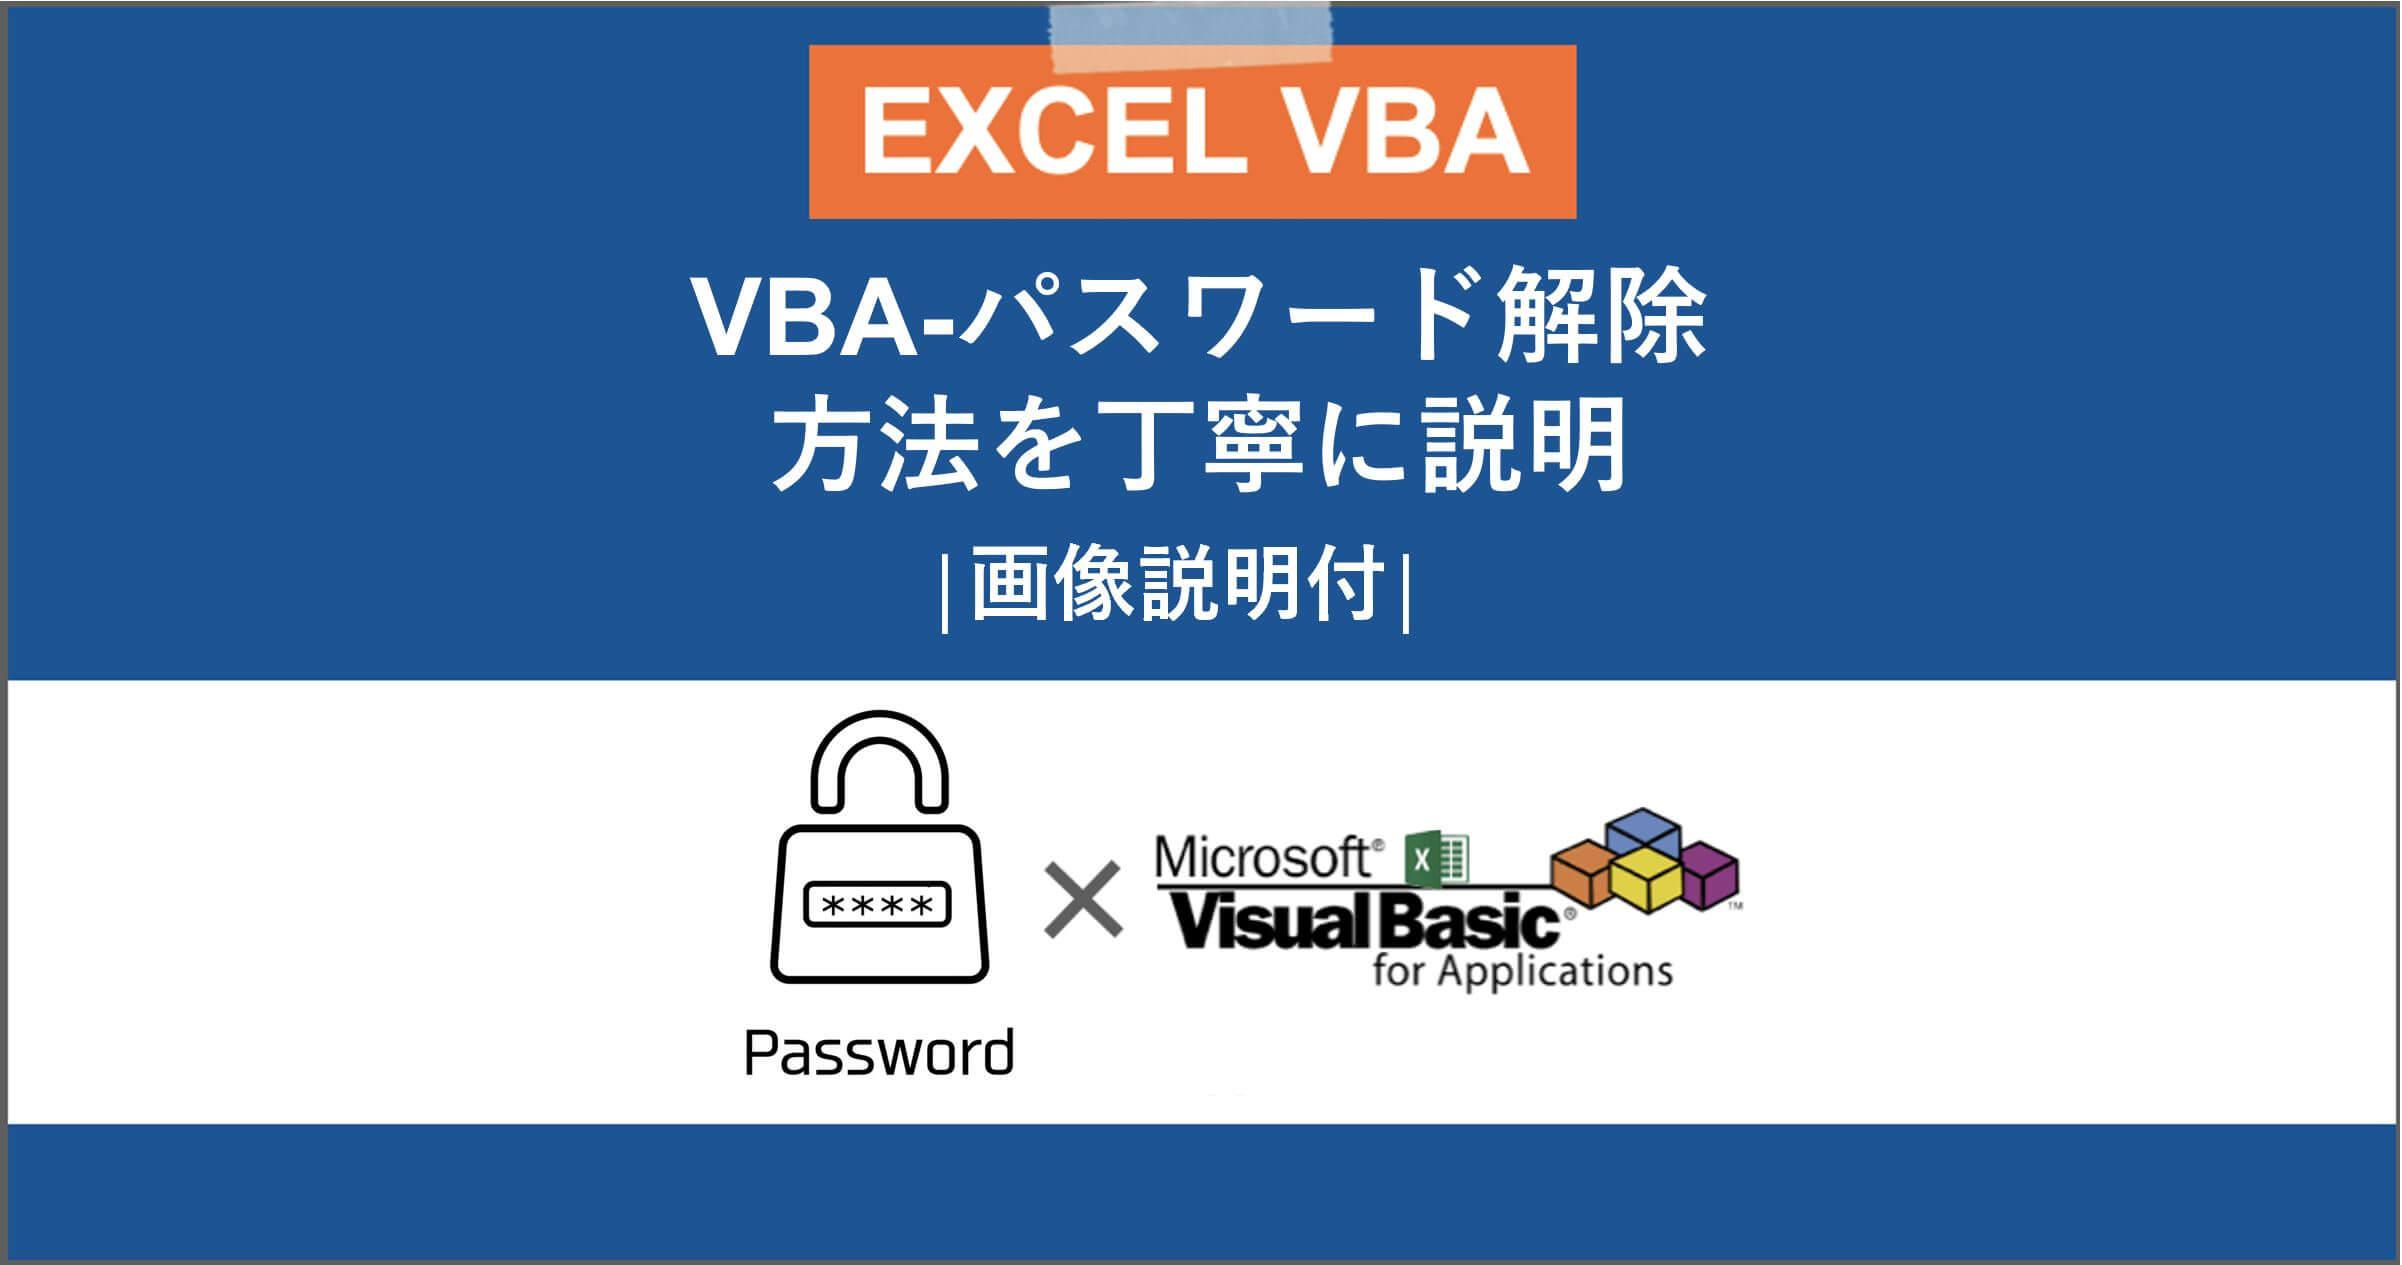 VBAパスワード解除方法を説明